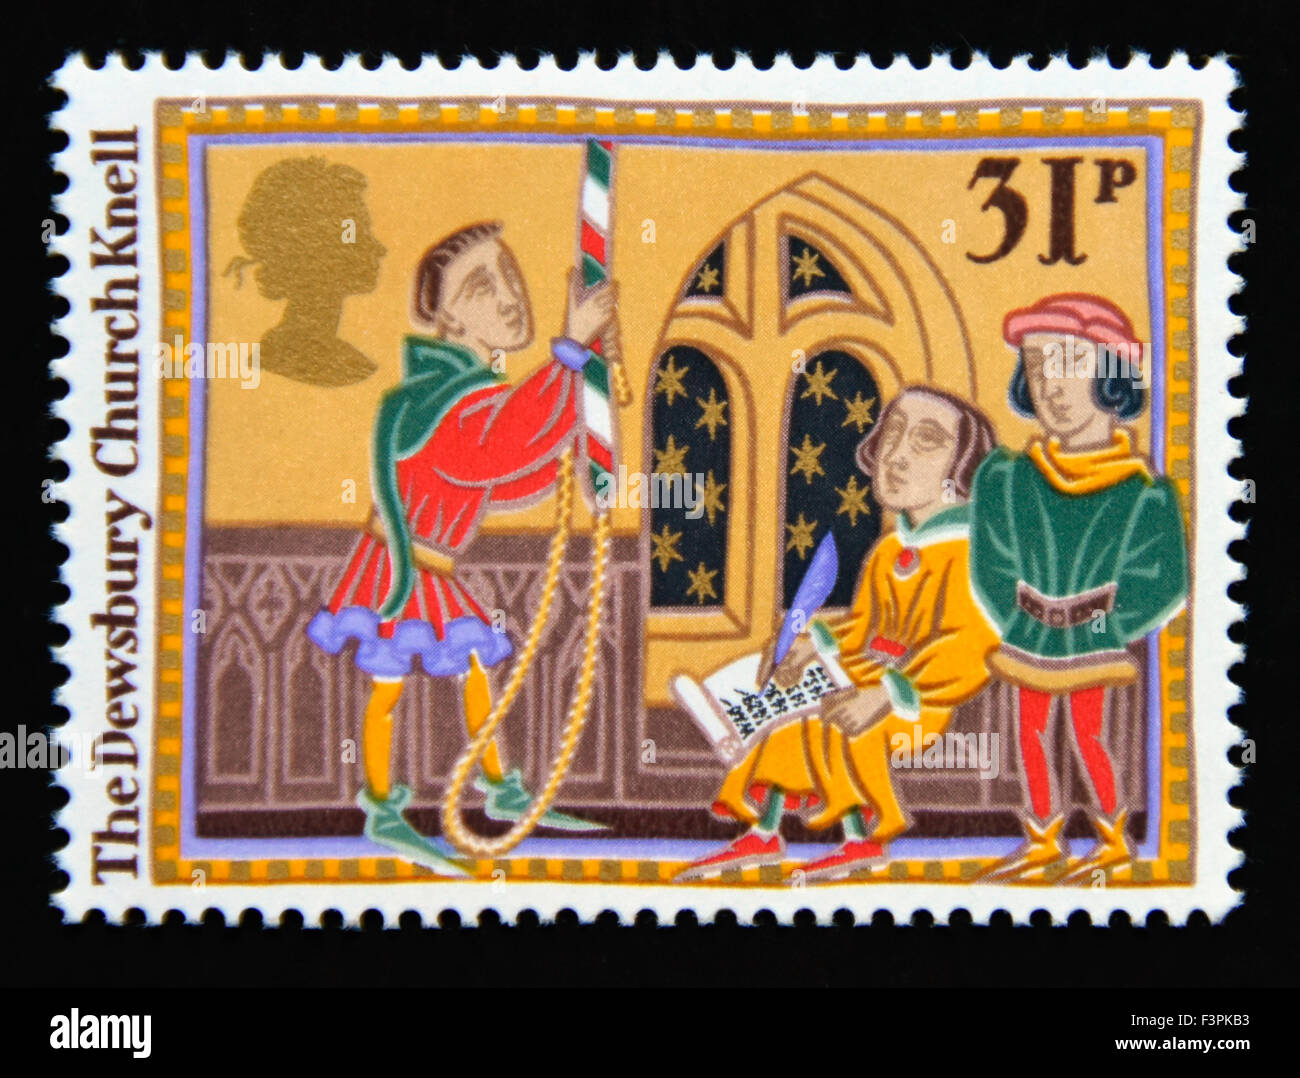 Postage stamp. Great Britain. Queen Elizabeth II. 1986.Christmas. Folk Customs. 31p. - Stock Image